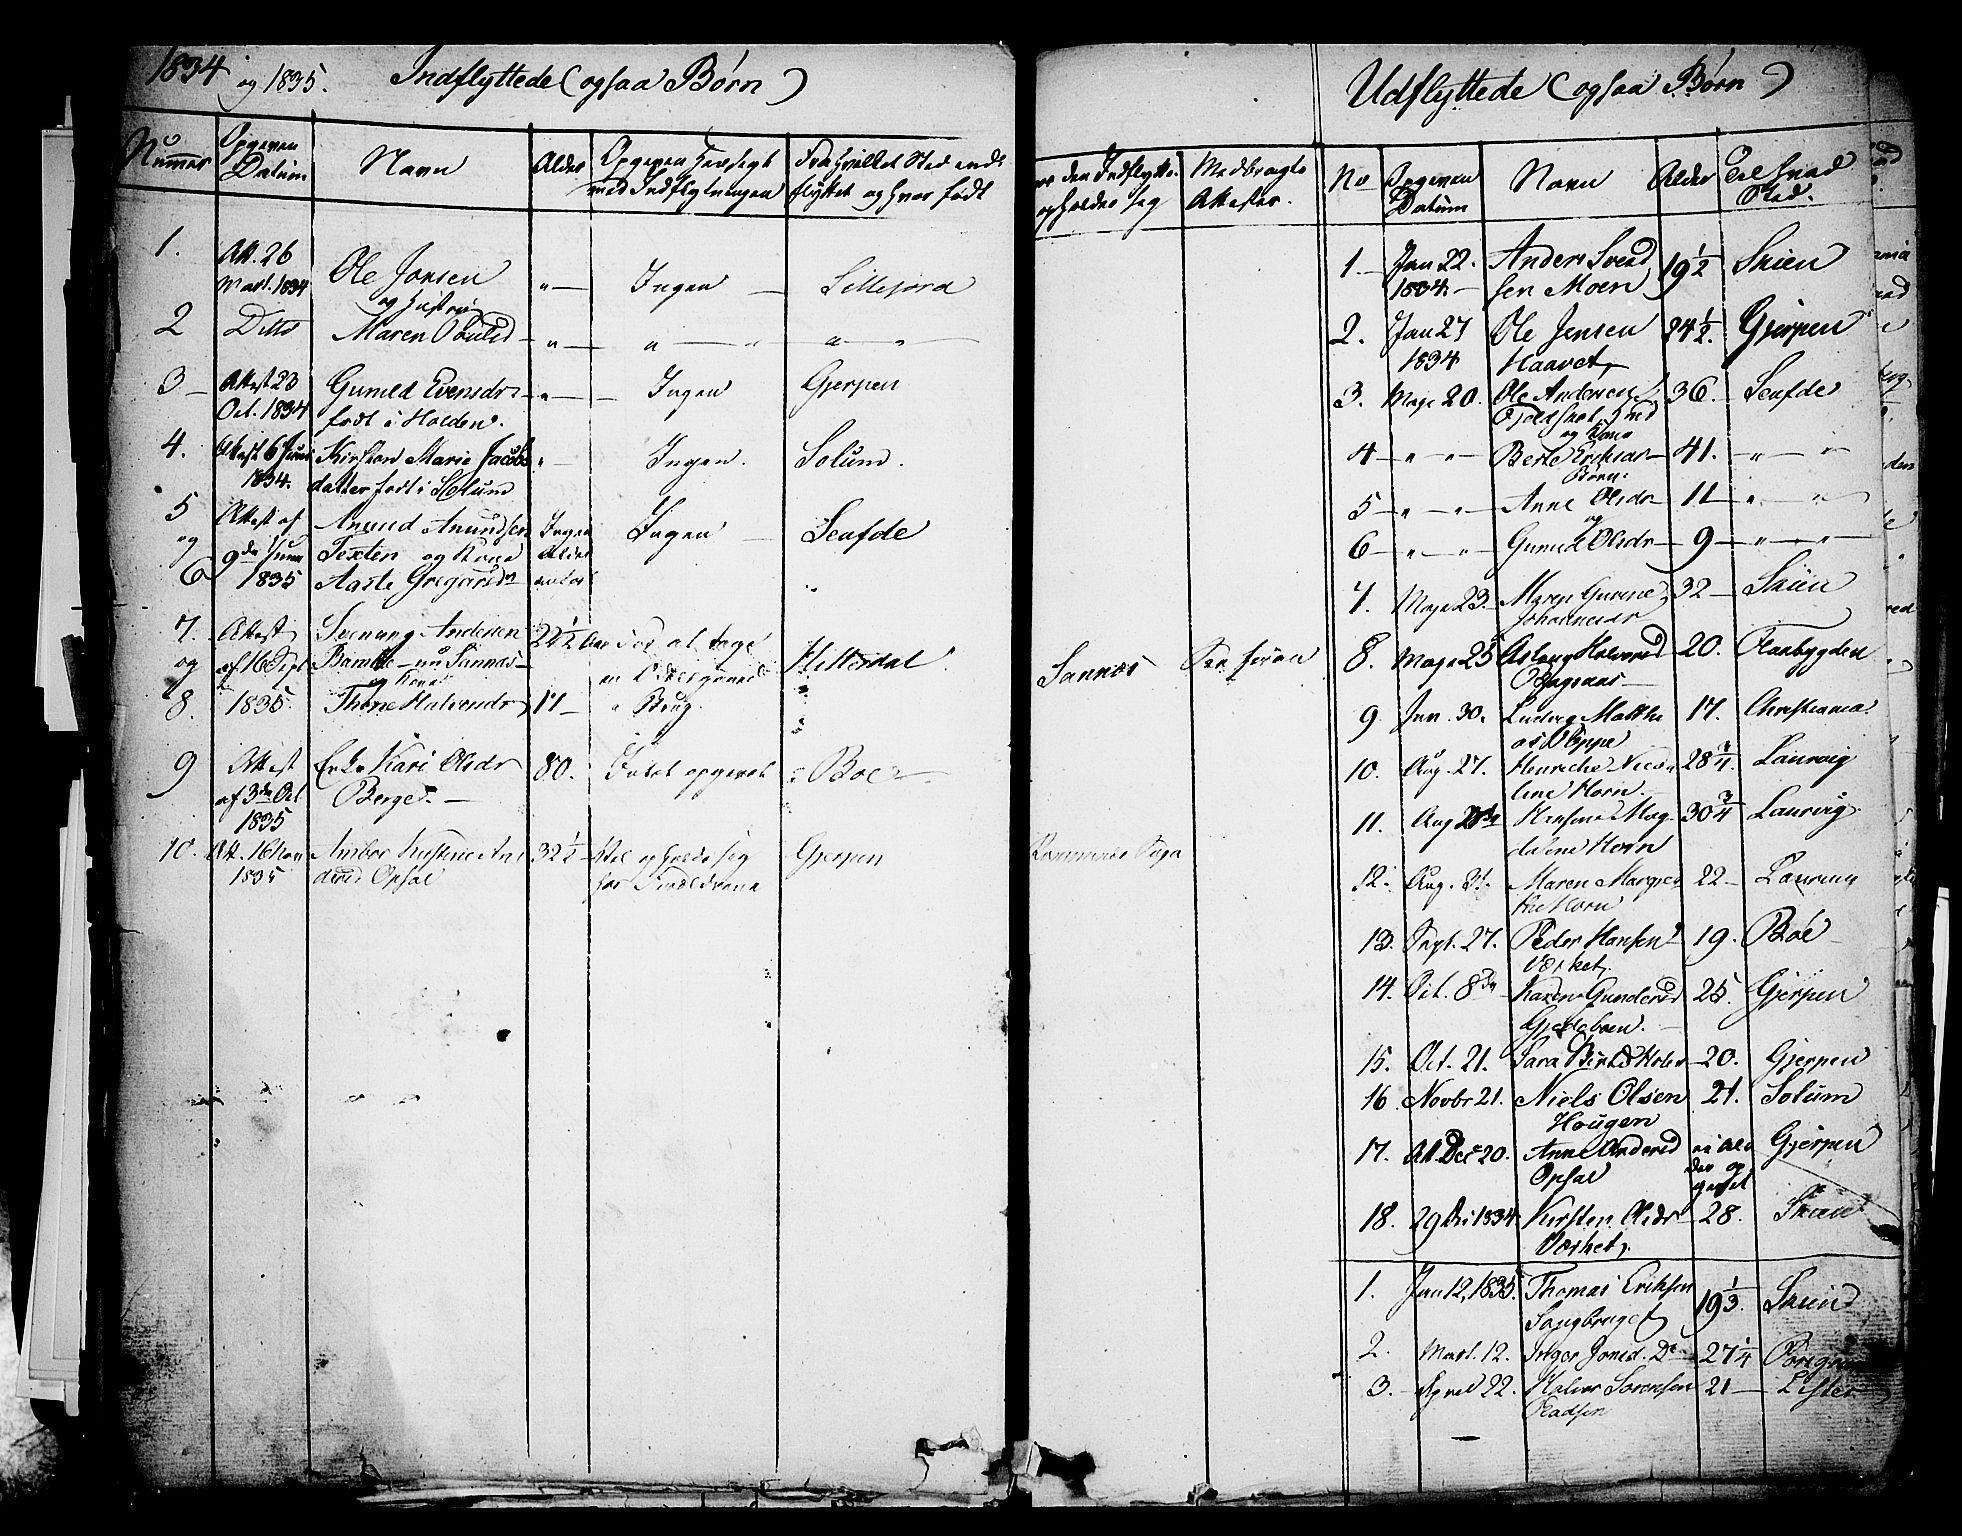 SAKO, Holla kirkebøker, F/Fa/L0004: Ministerialbok nr. 4, 1830-1848, s. 394